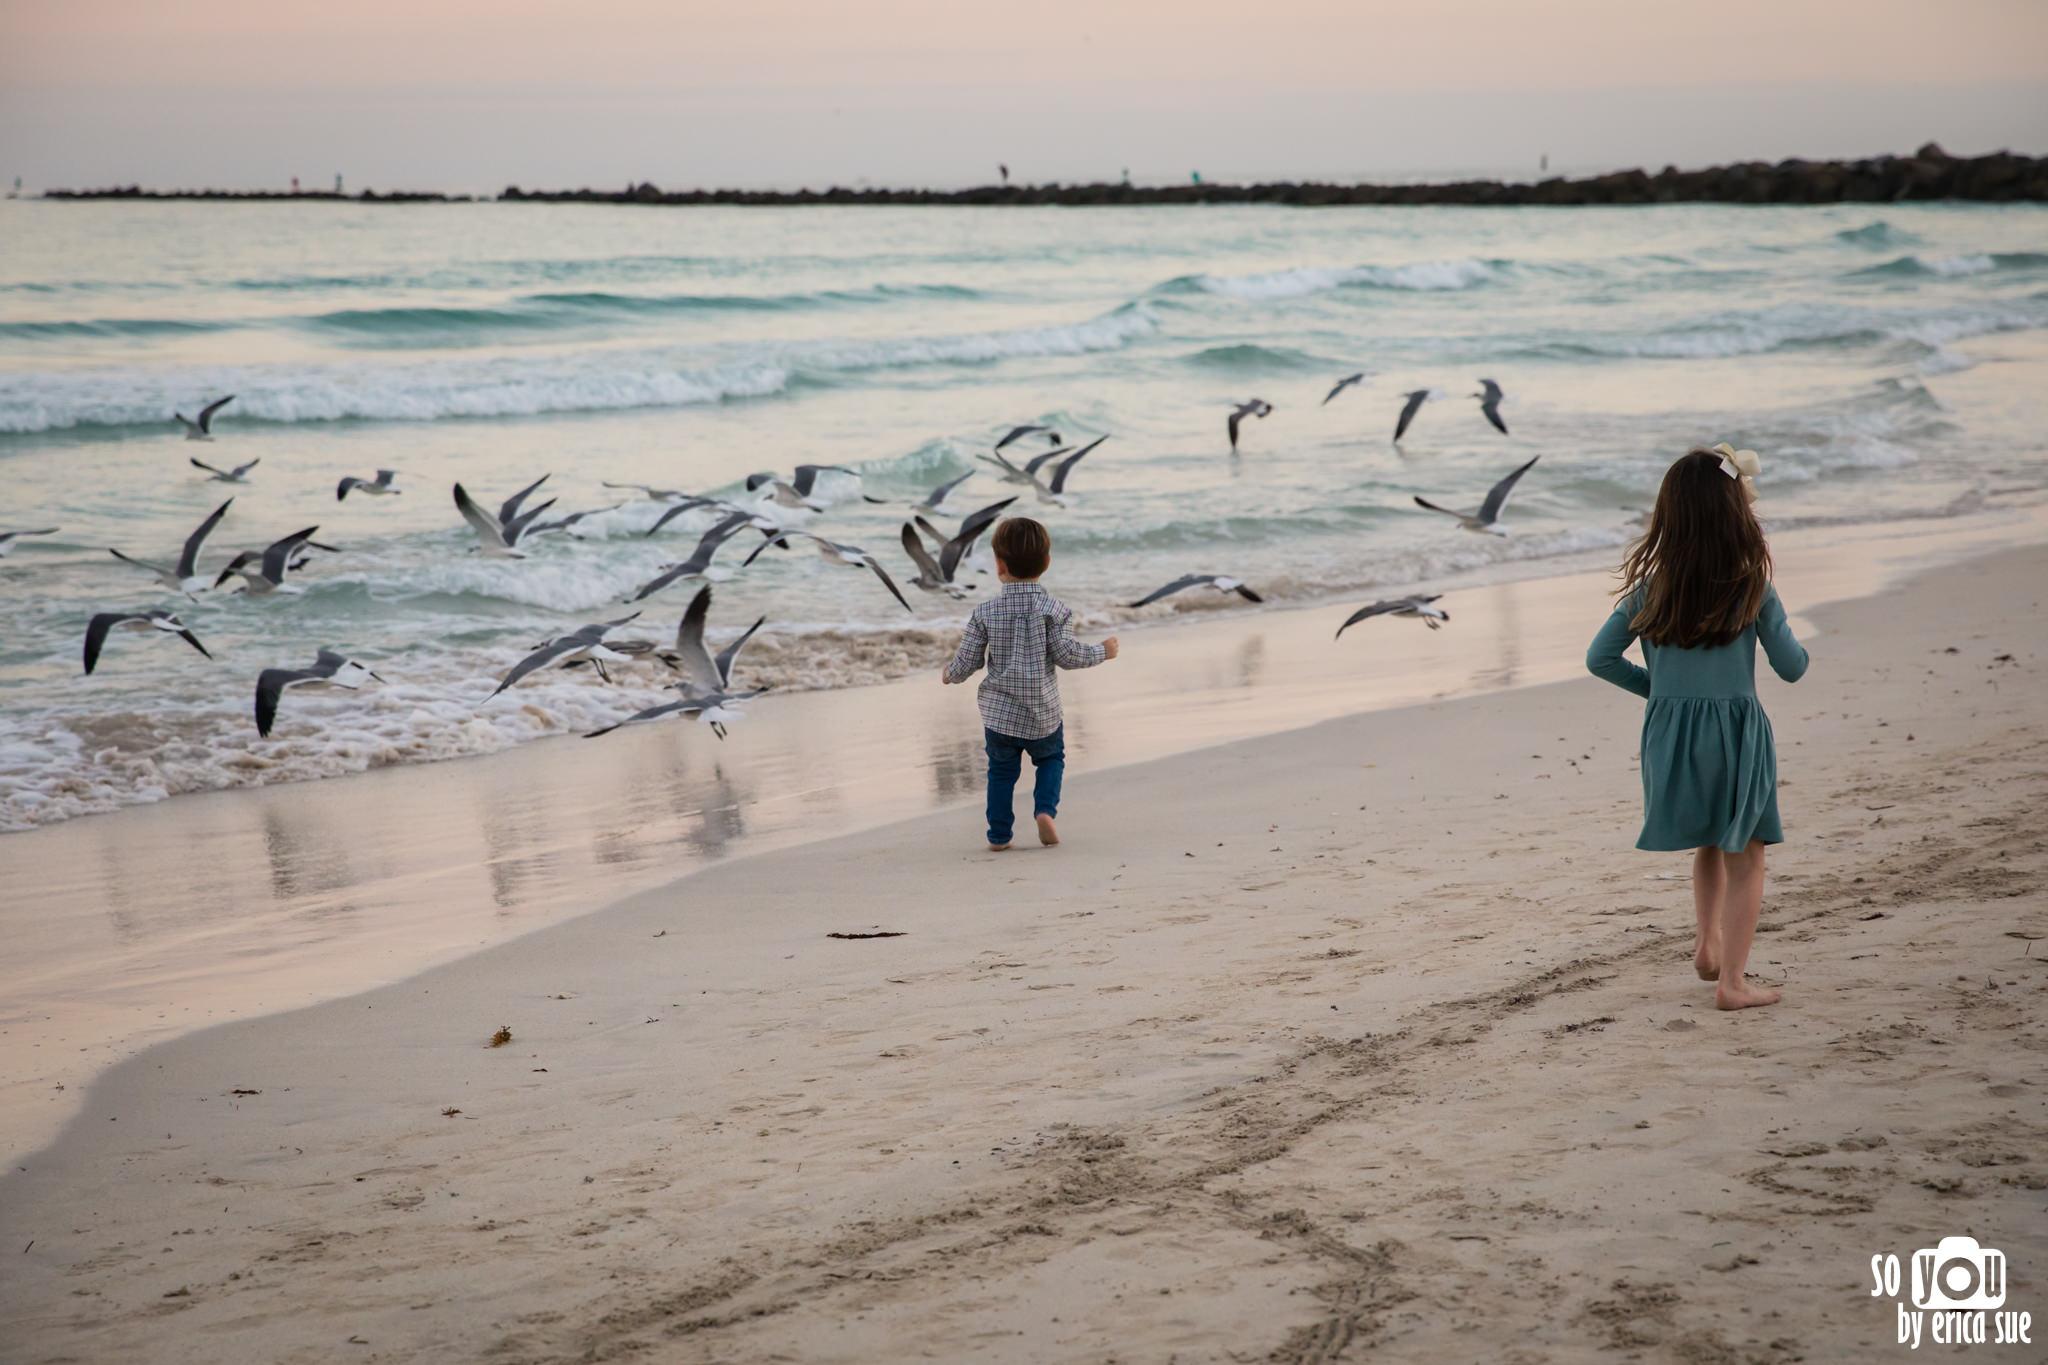 so-you-by-erica-sue-miami-maternity-photographer-south-pointe-park-9565.jpg